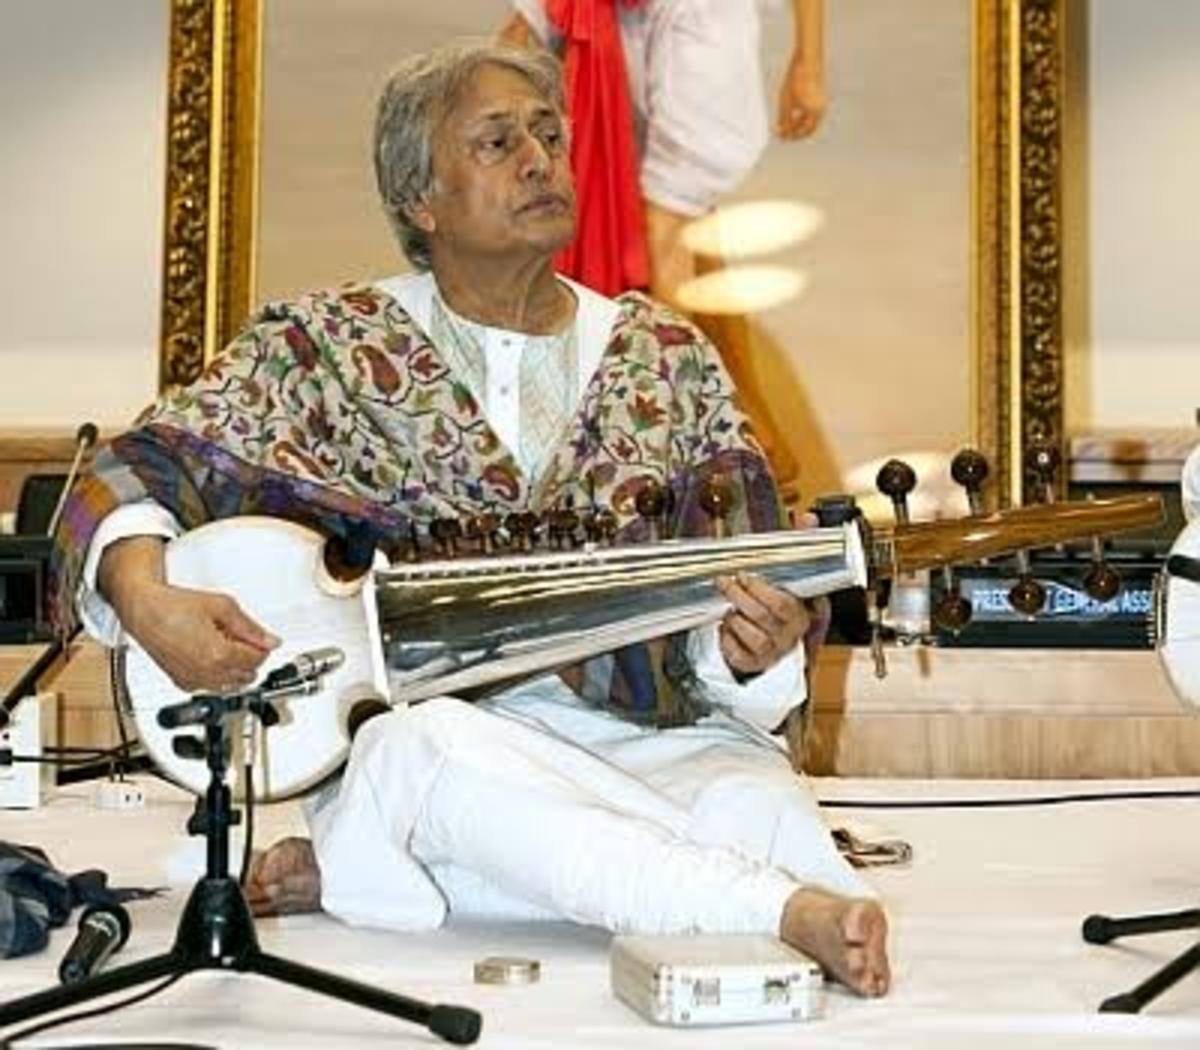 Indian musical instrument, the Sarod Artist—Ustaad Amzad Ali Khan